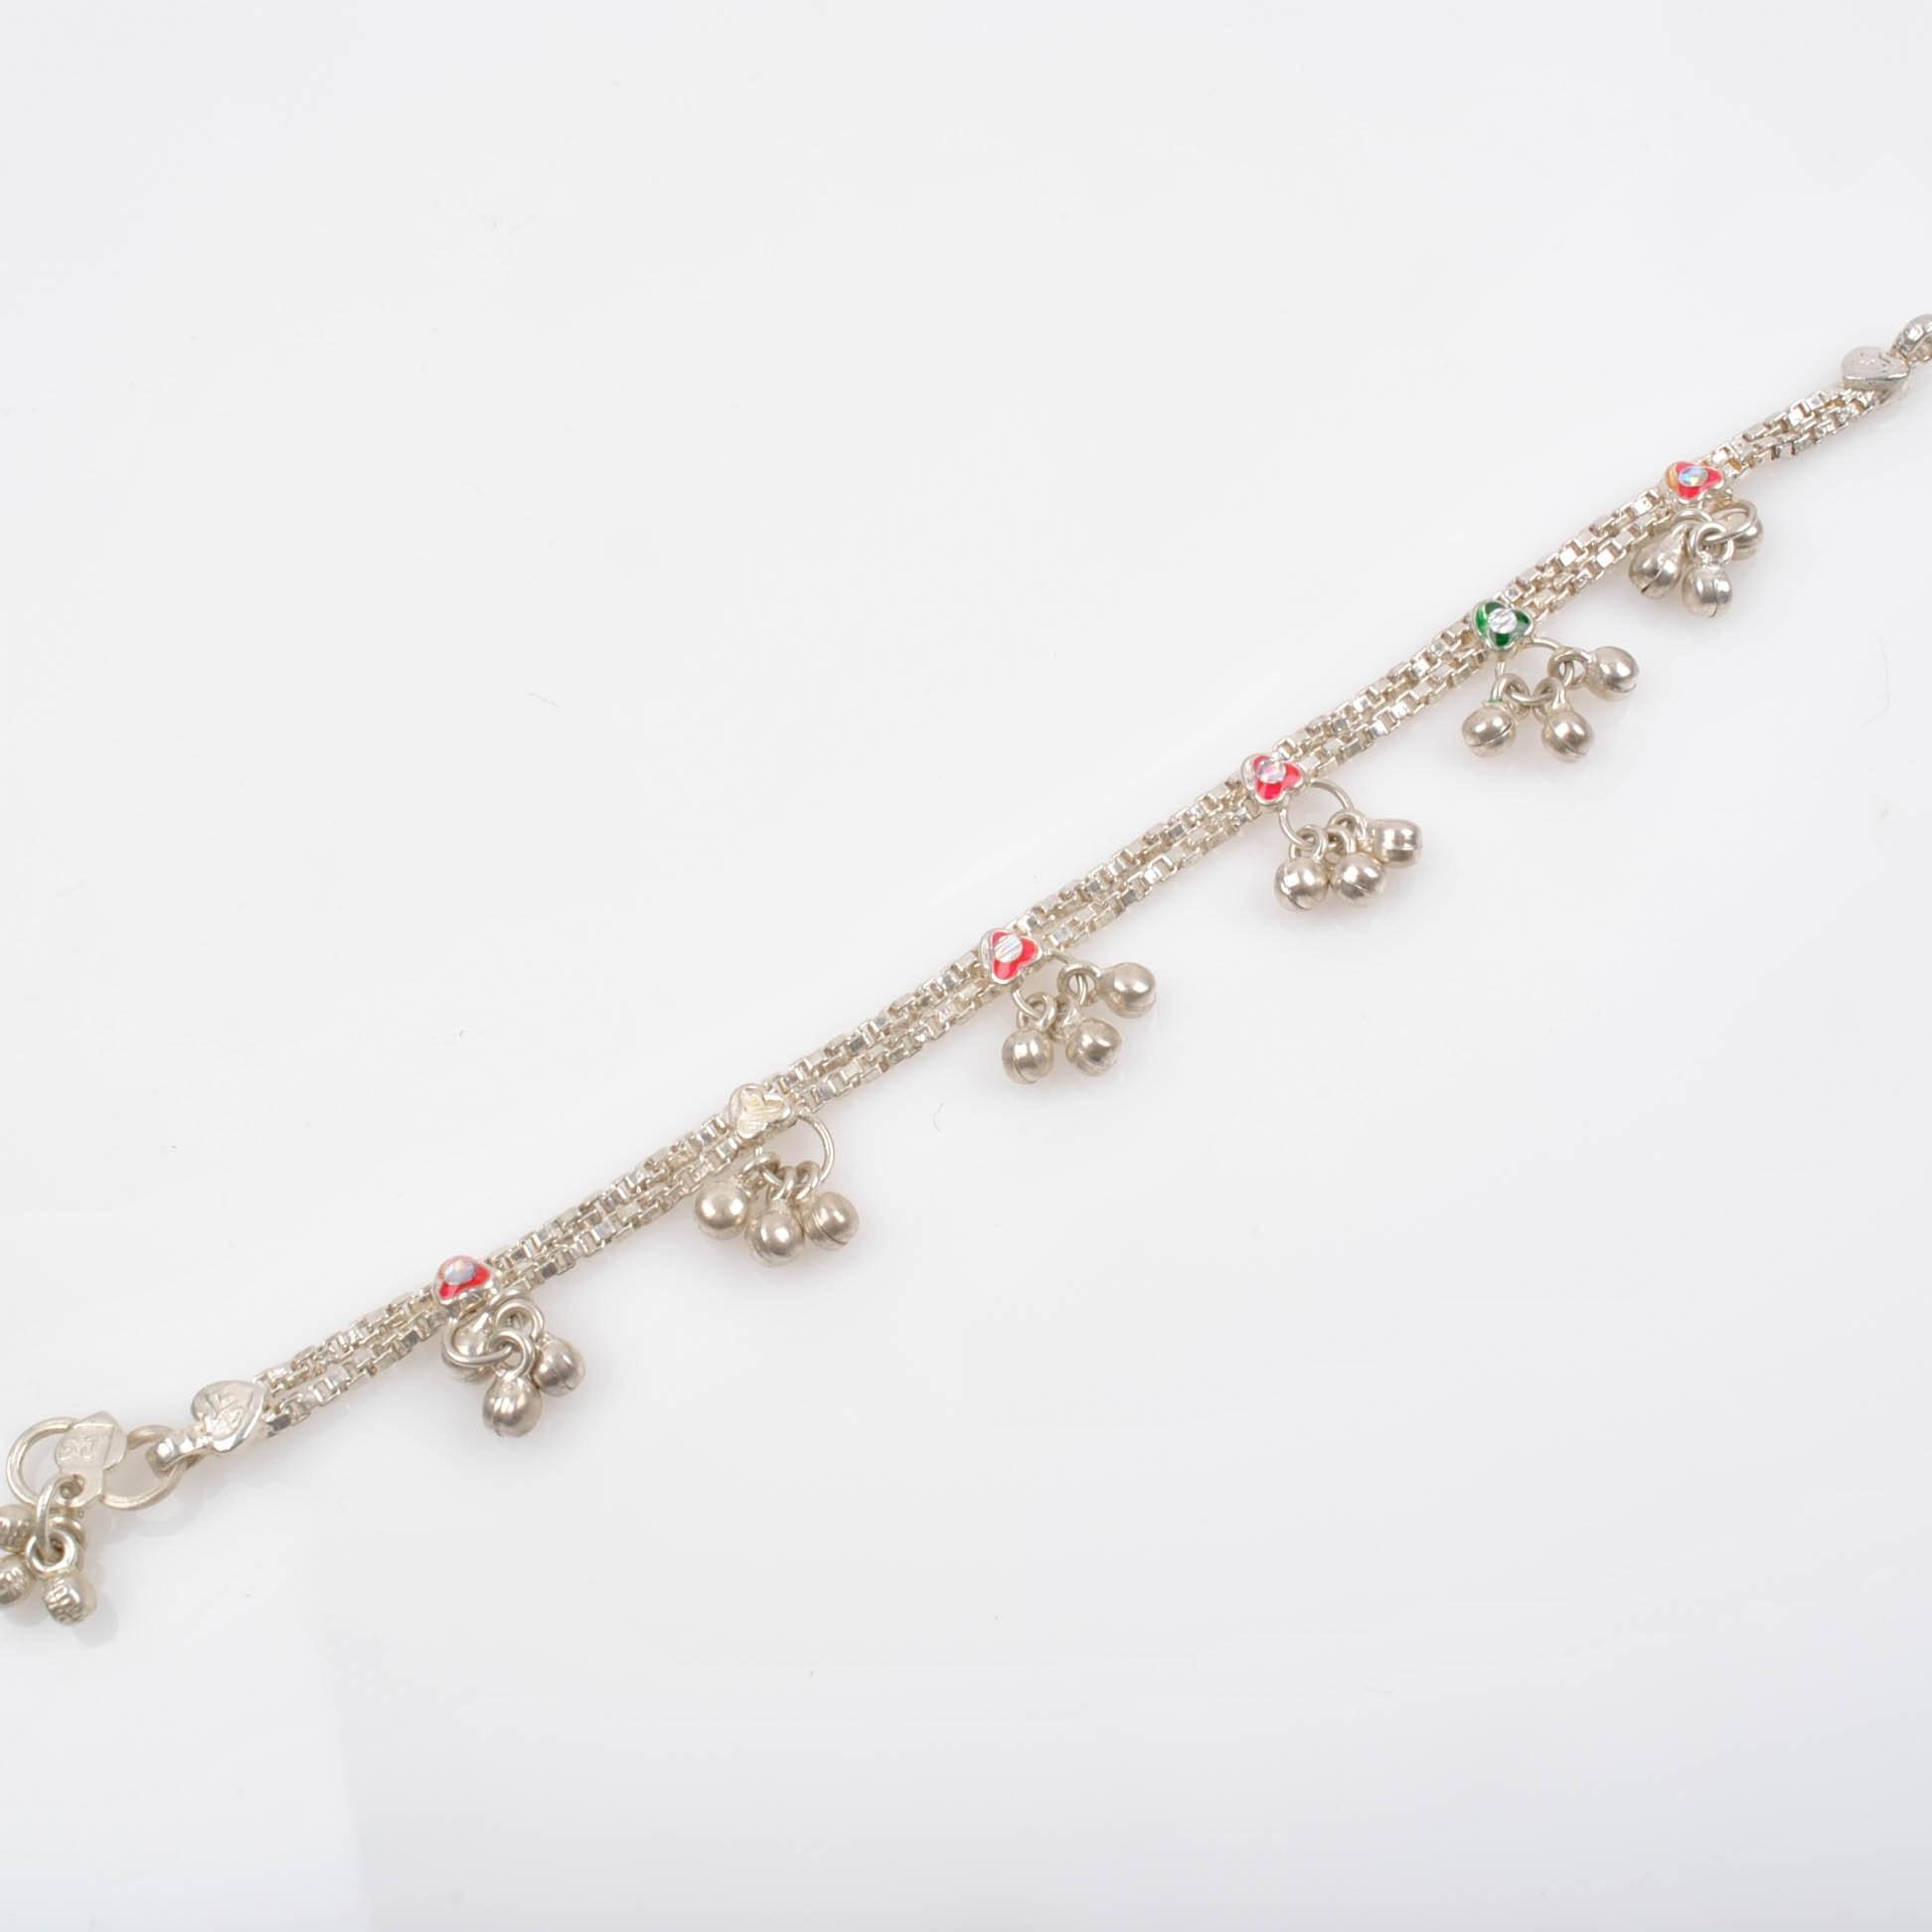 900 Silver Dangle Bracelet